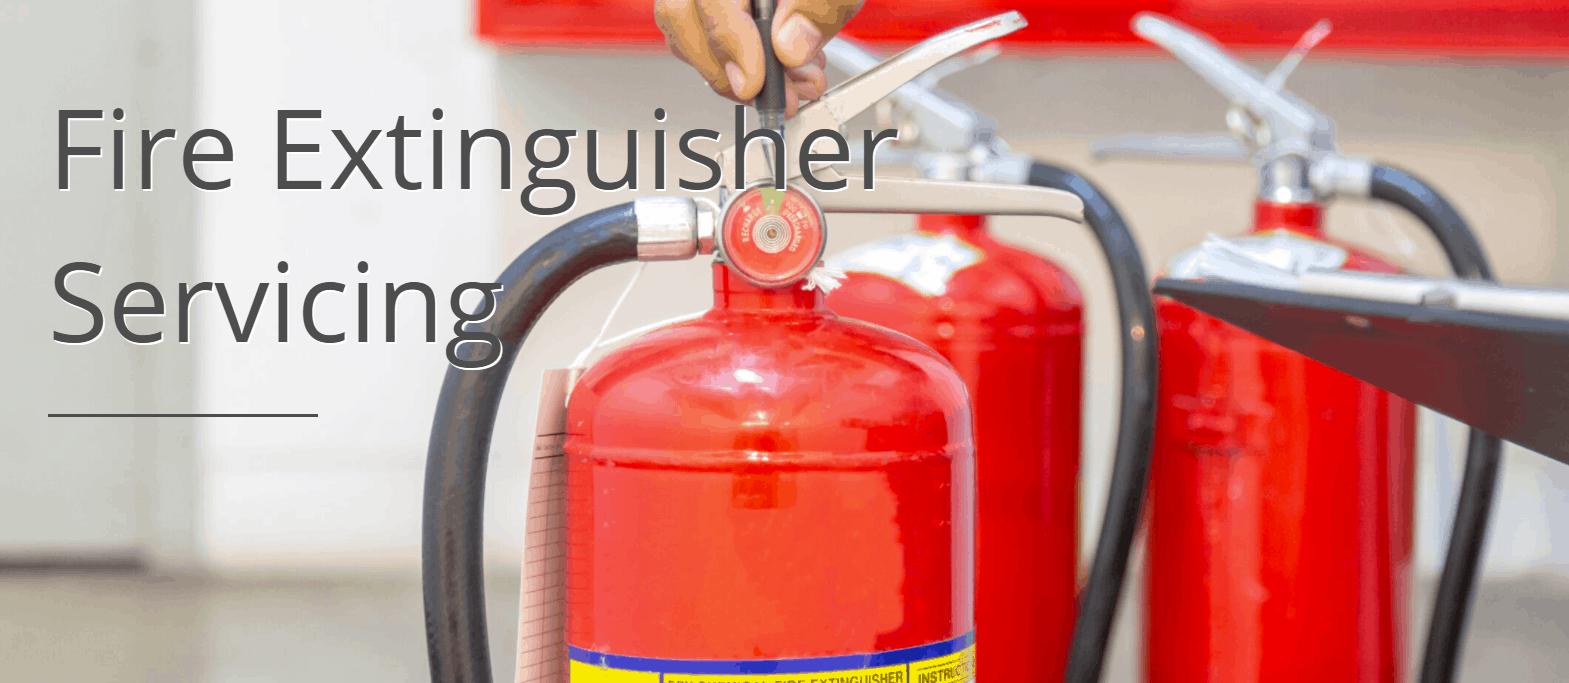 Fire Extinguisher Servicing Mobile